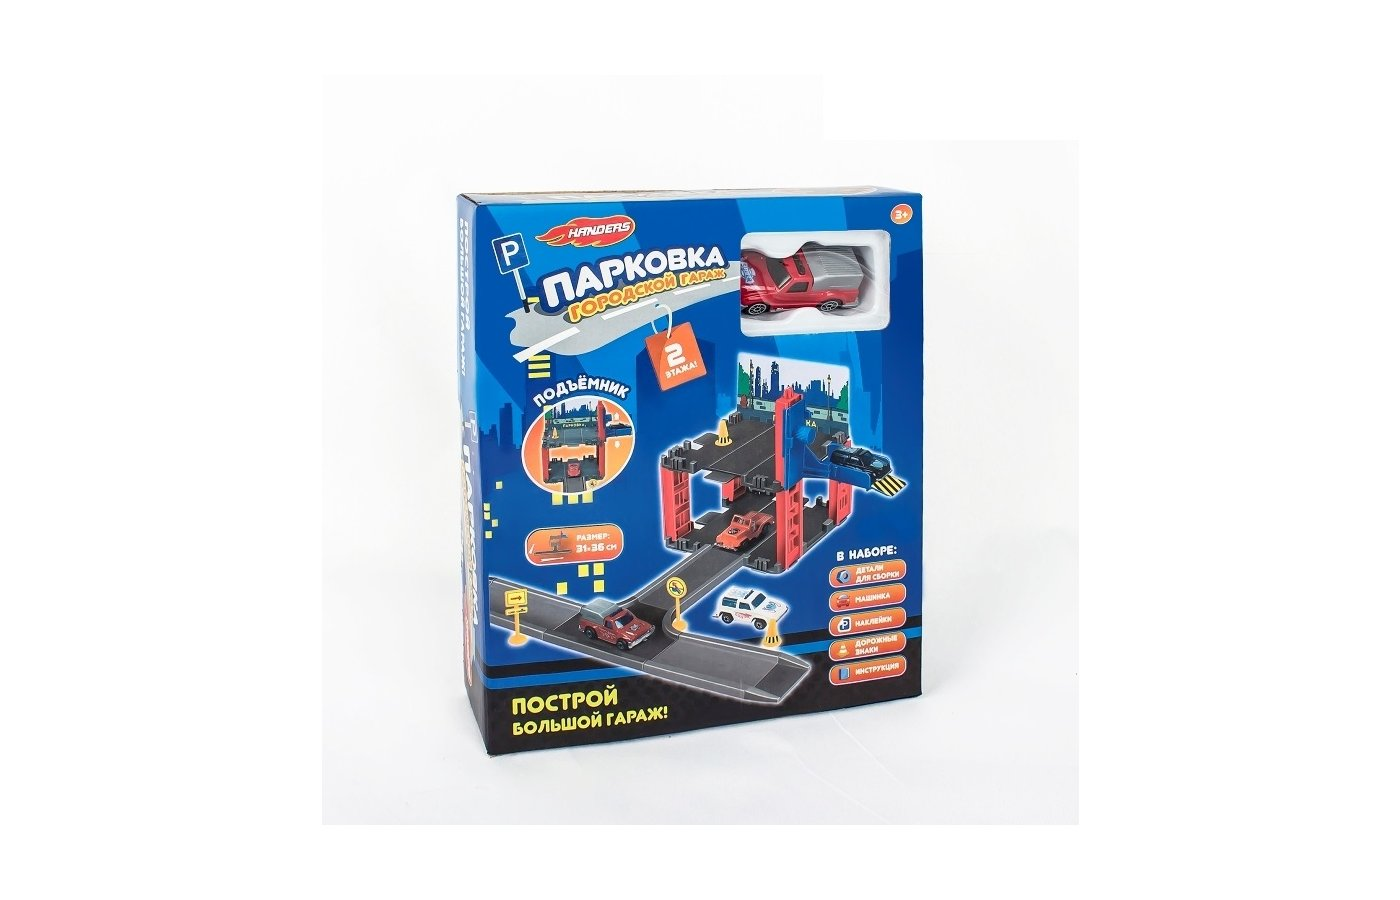 Handers HAC1610-001 Парковка городской гараж 22 детали